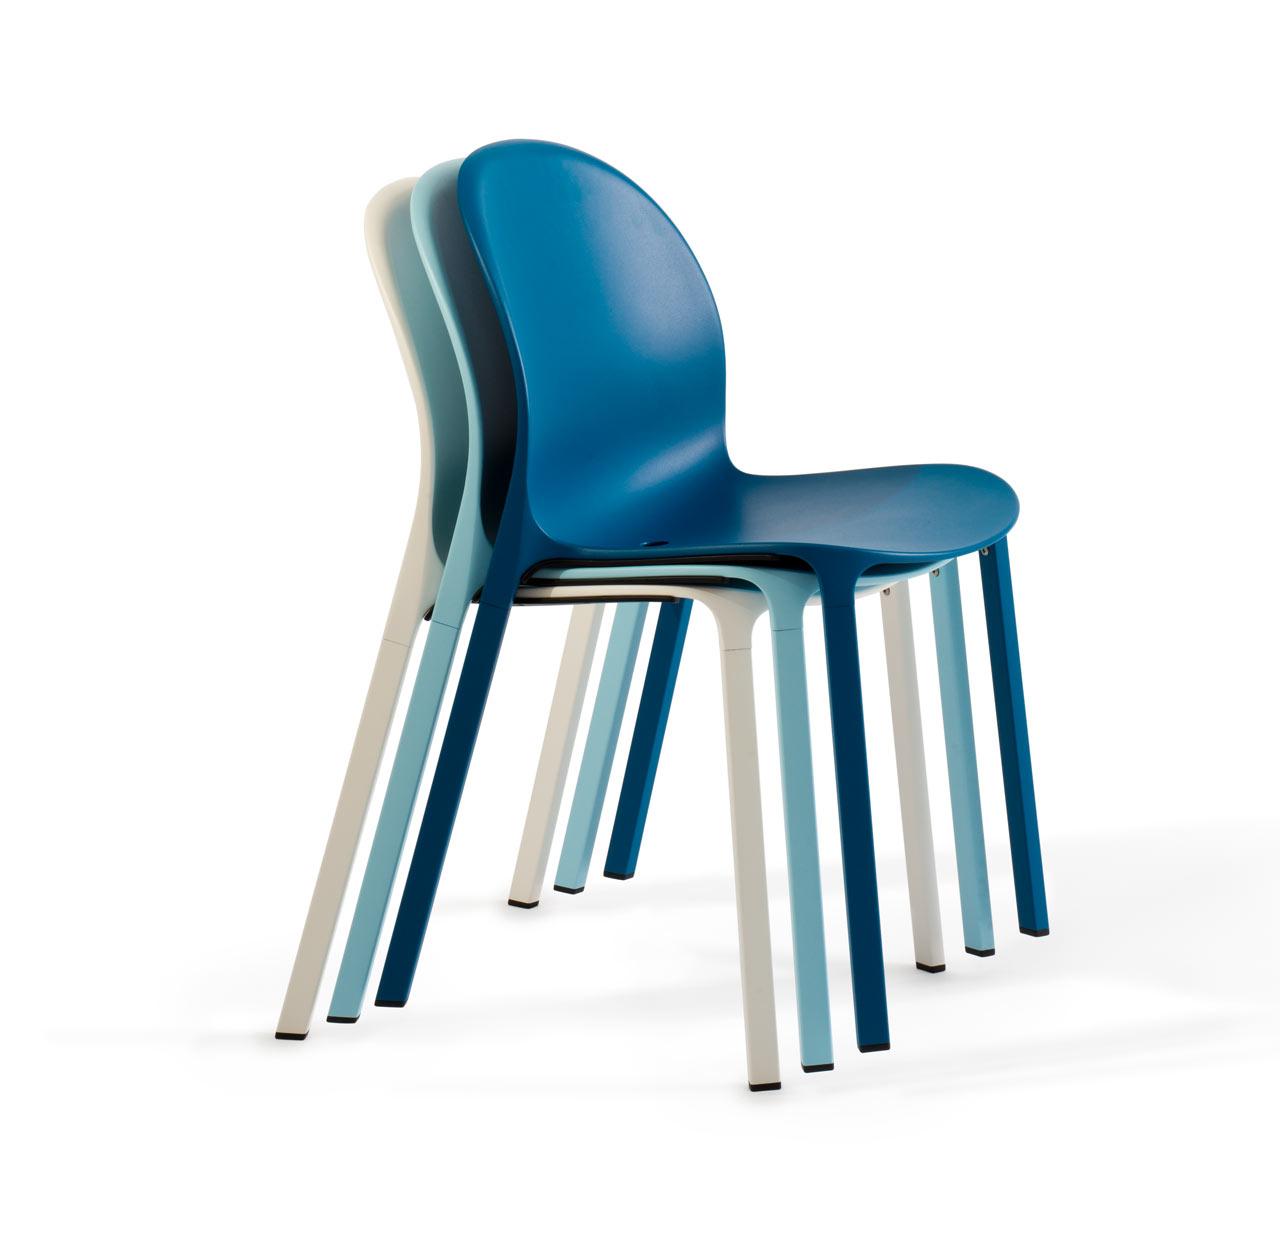 Get Out! Olivares Aluminum Chair